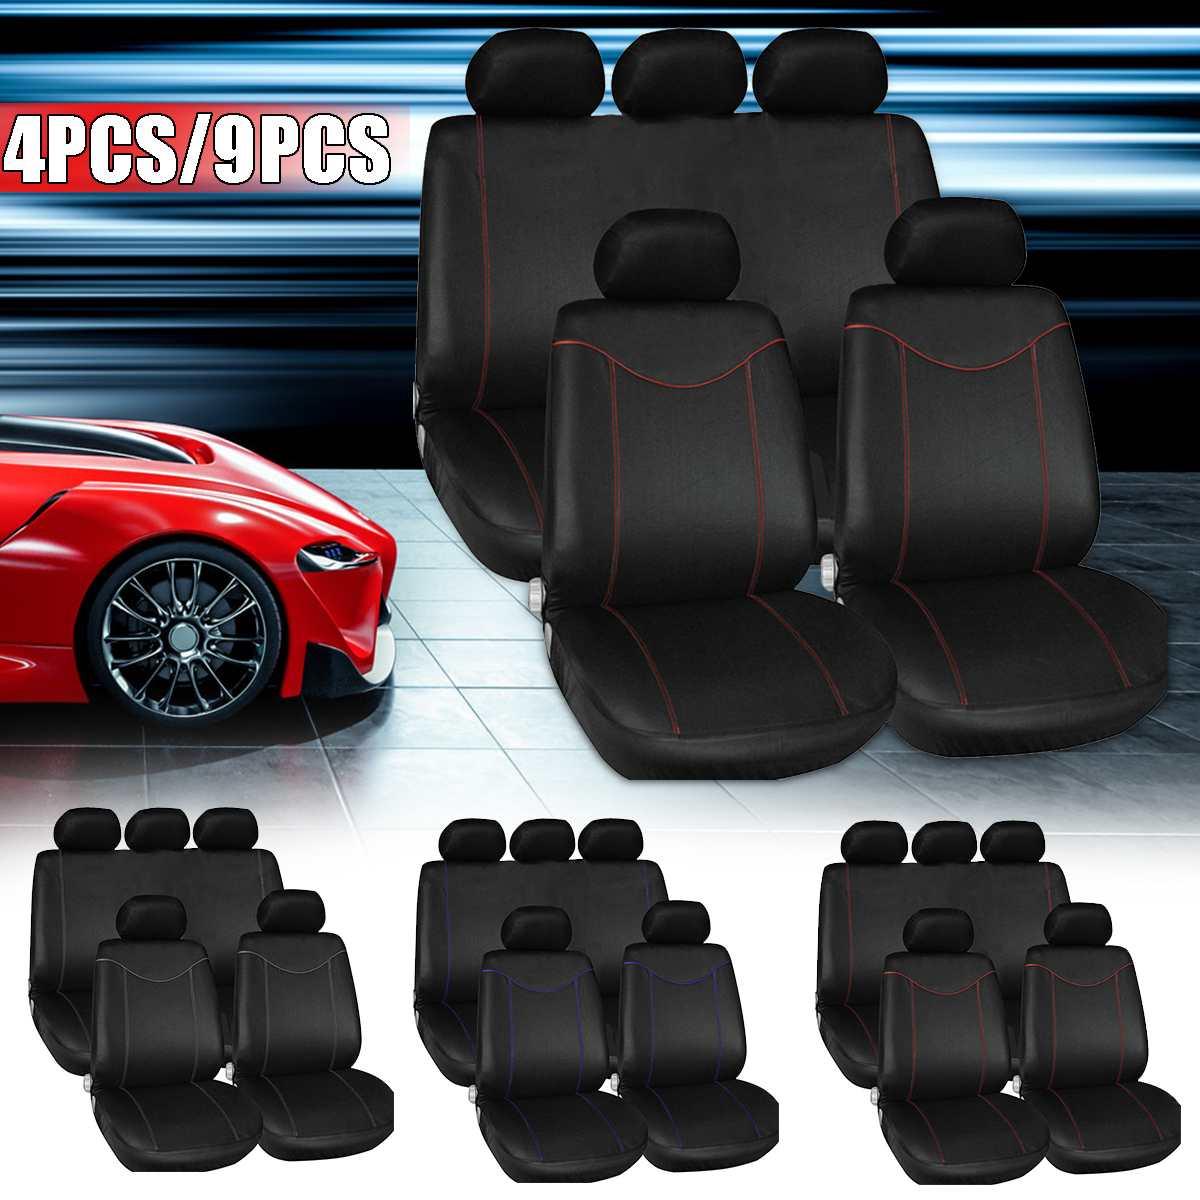 Tampas de assento do carro universal conjunto auto completo 2/5 seaters protetor almofada frente capa traseira interior acessórios do veículo tampas assento